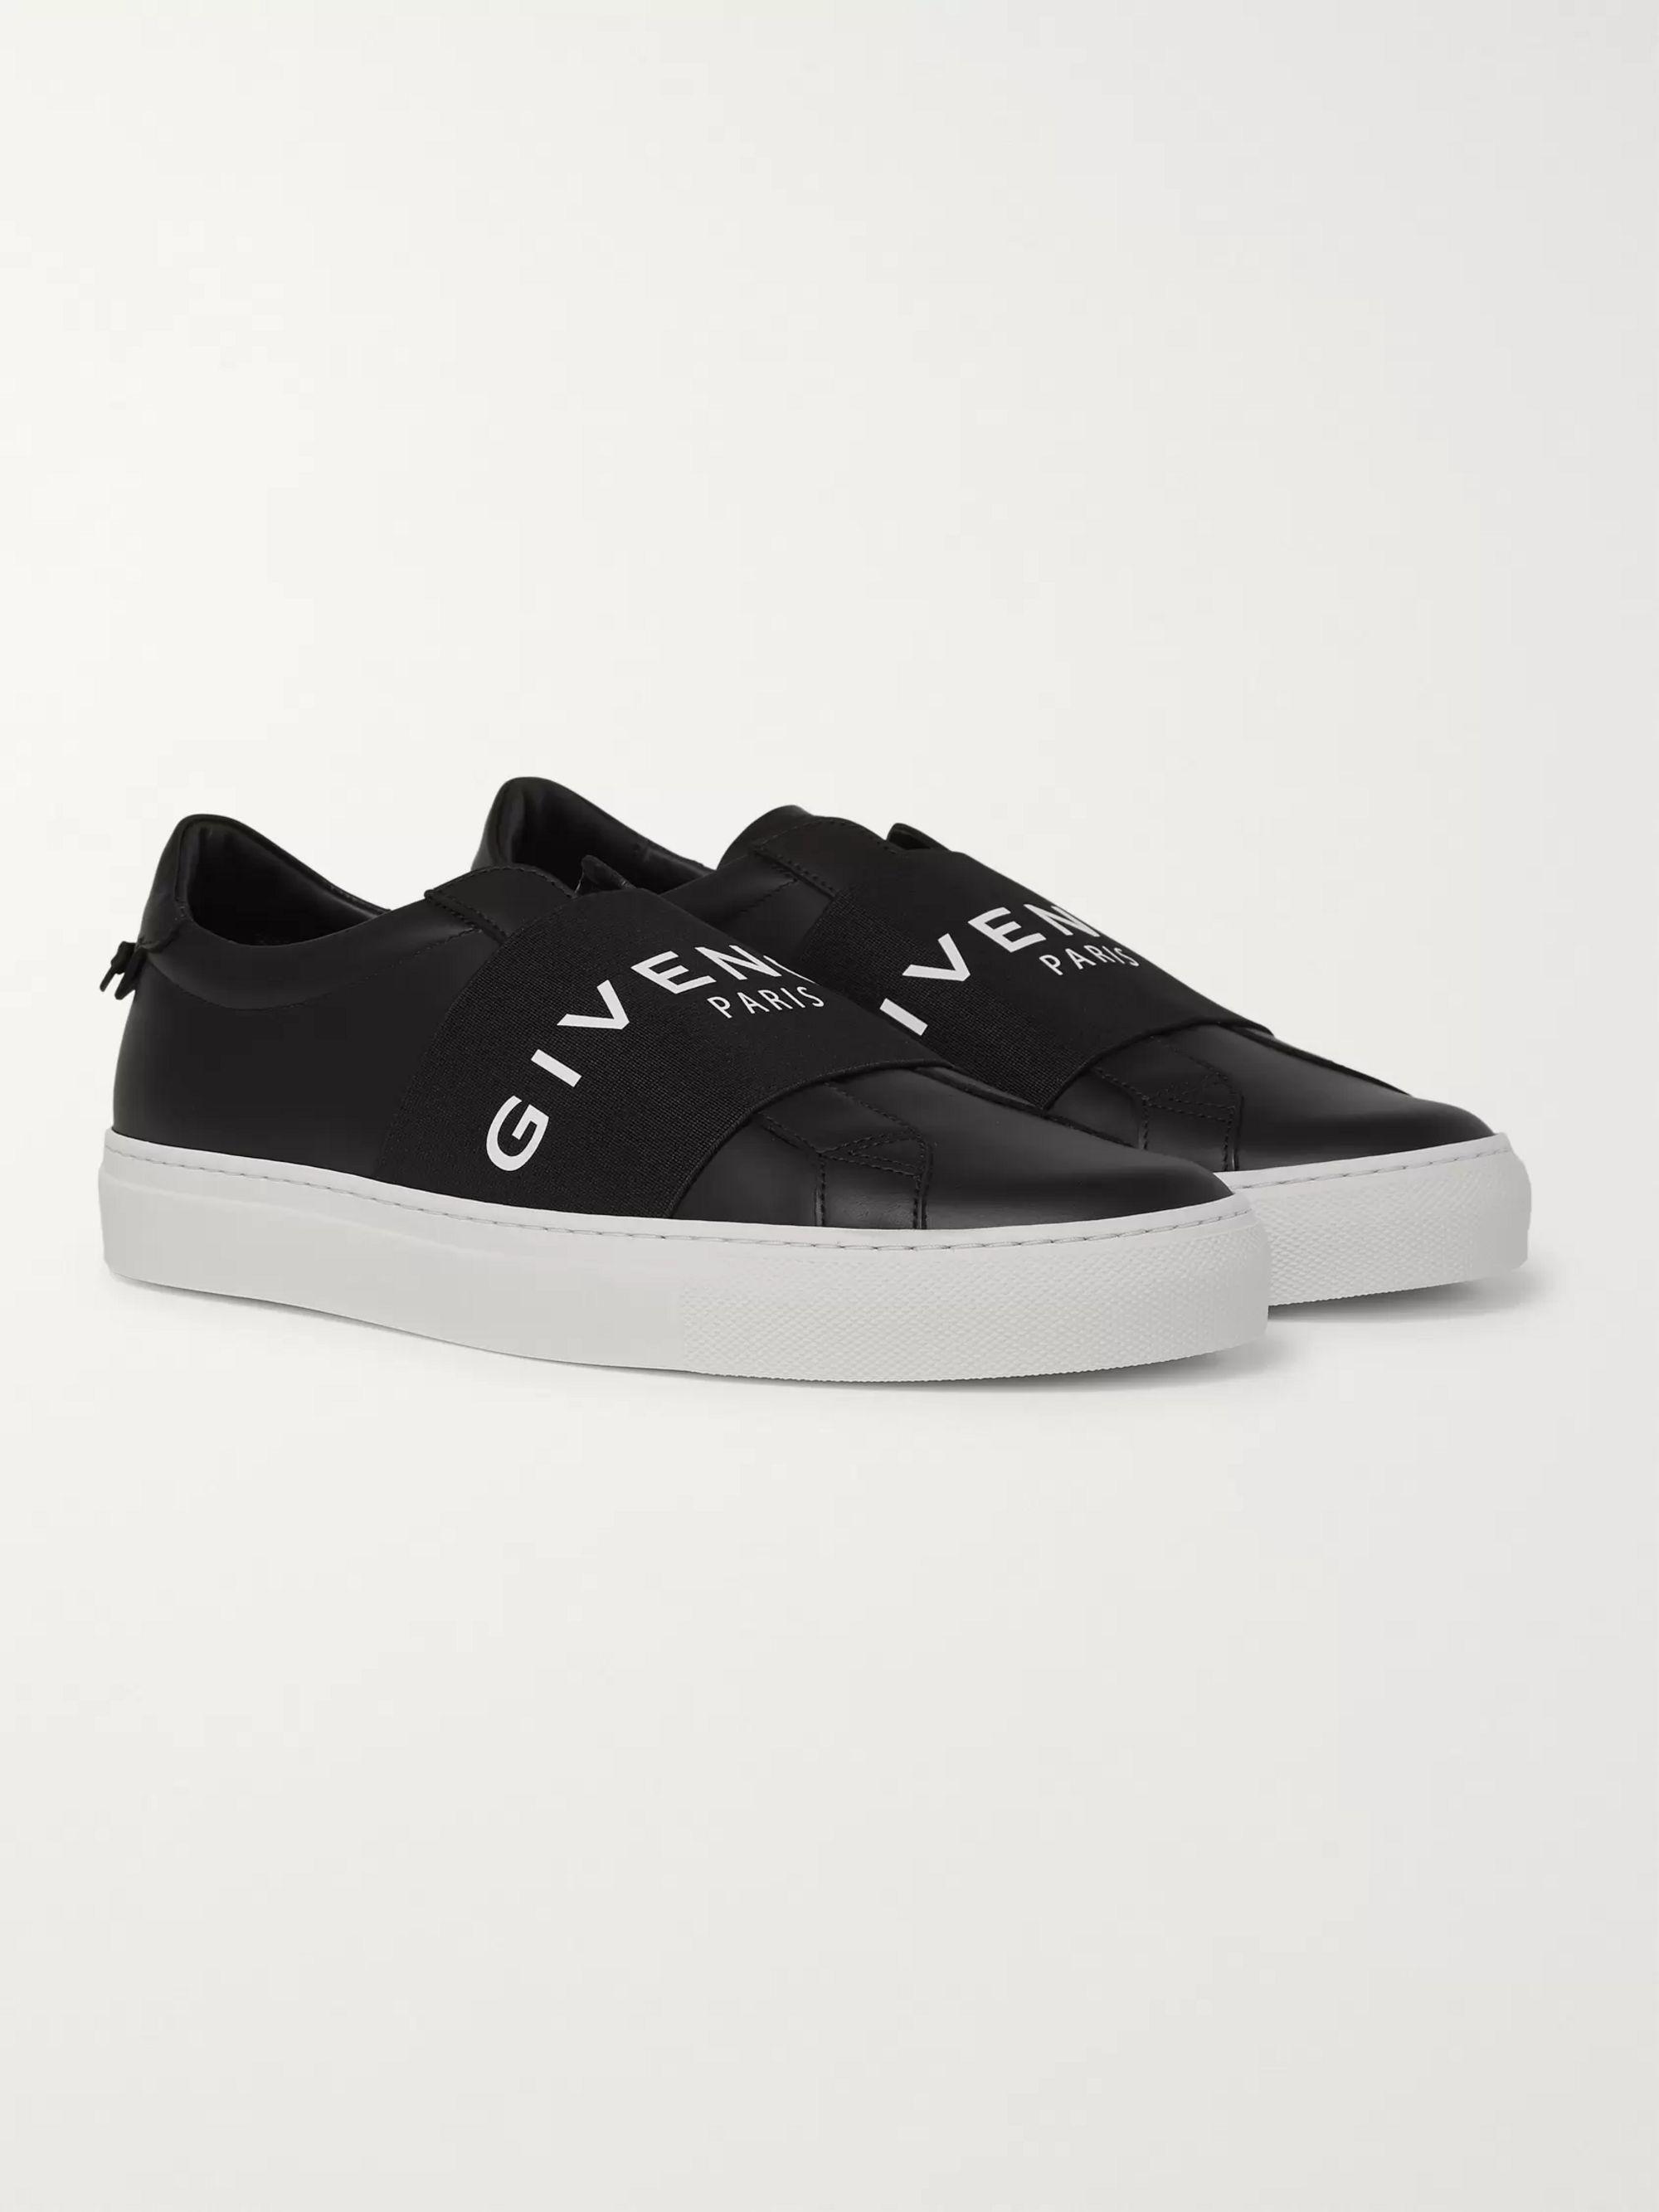 Urban Street Logo Print Leather Slip On Sneakers